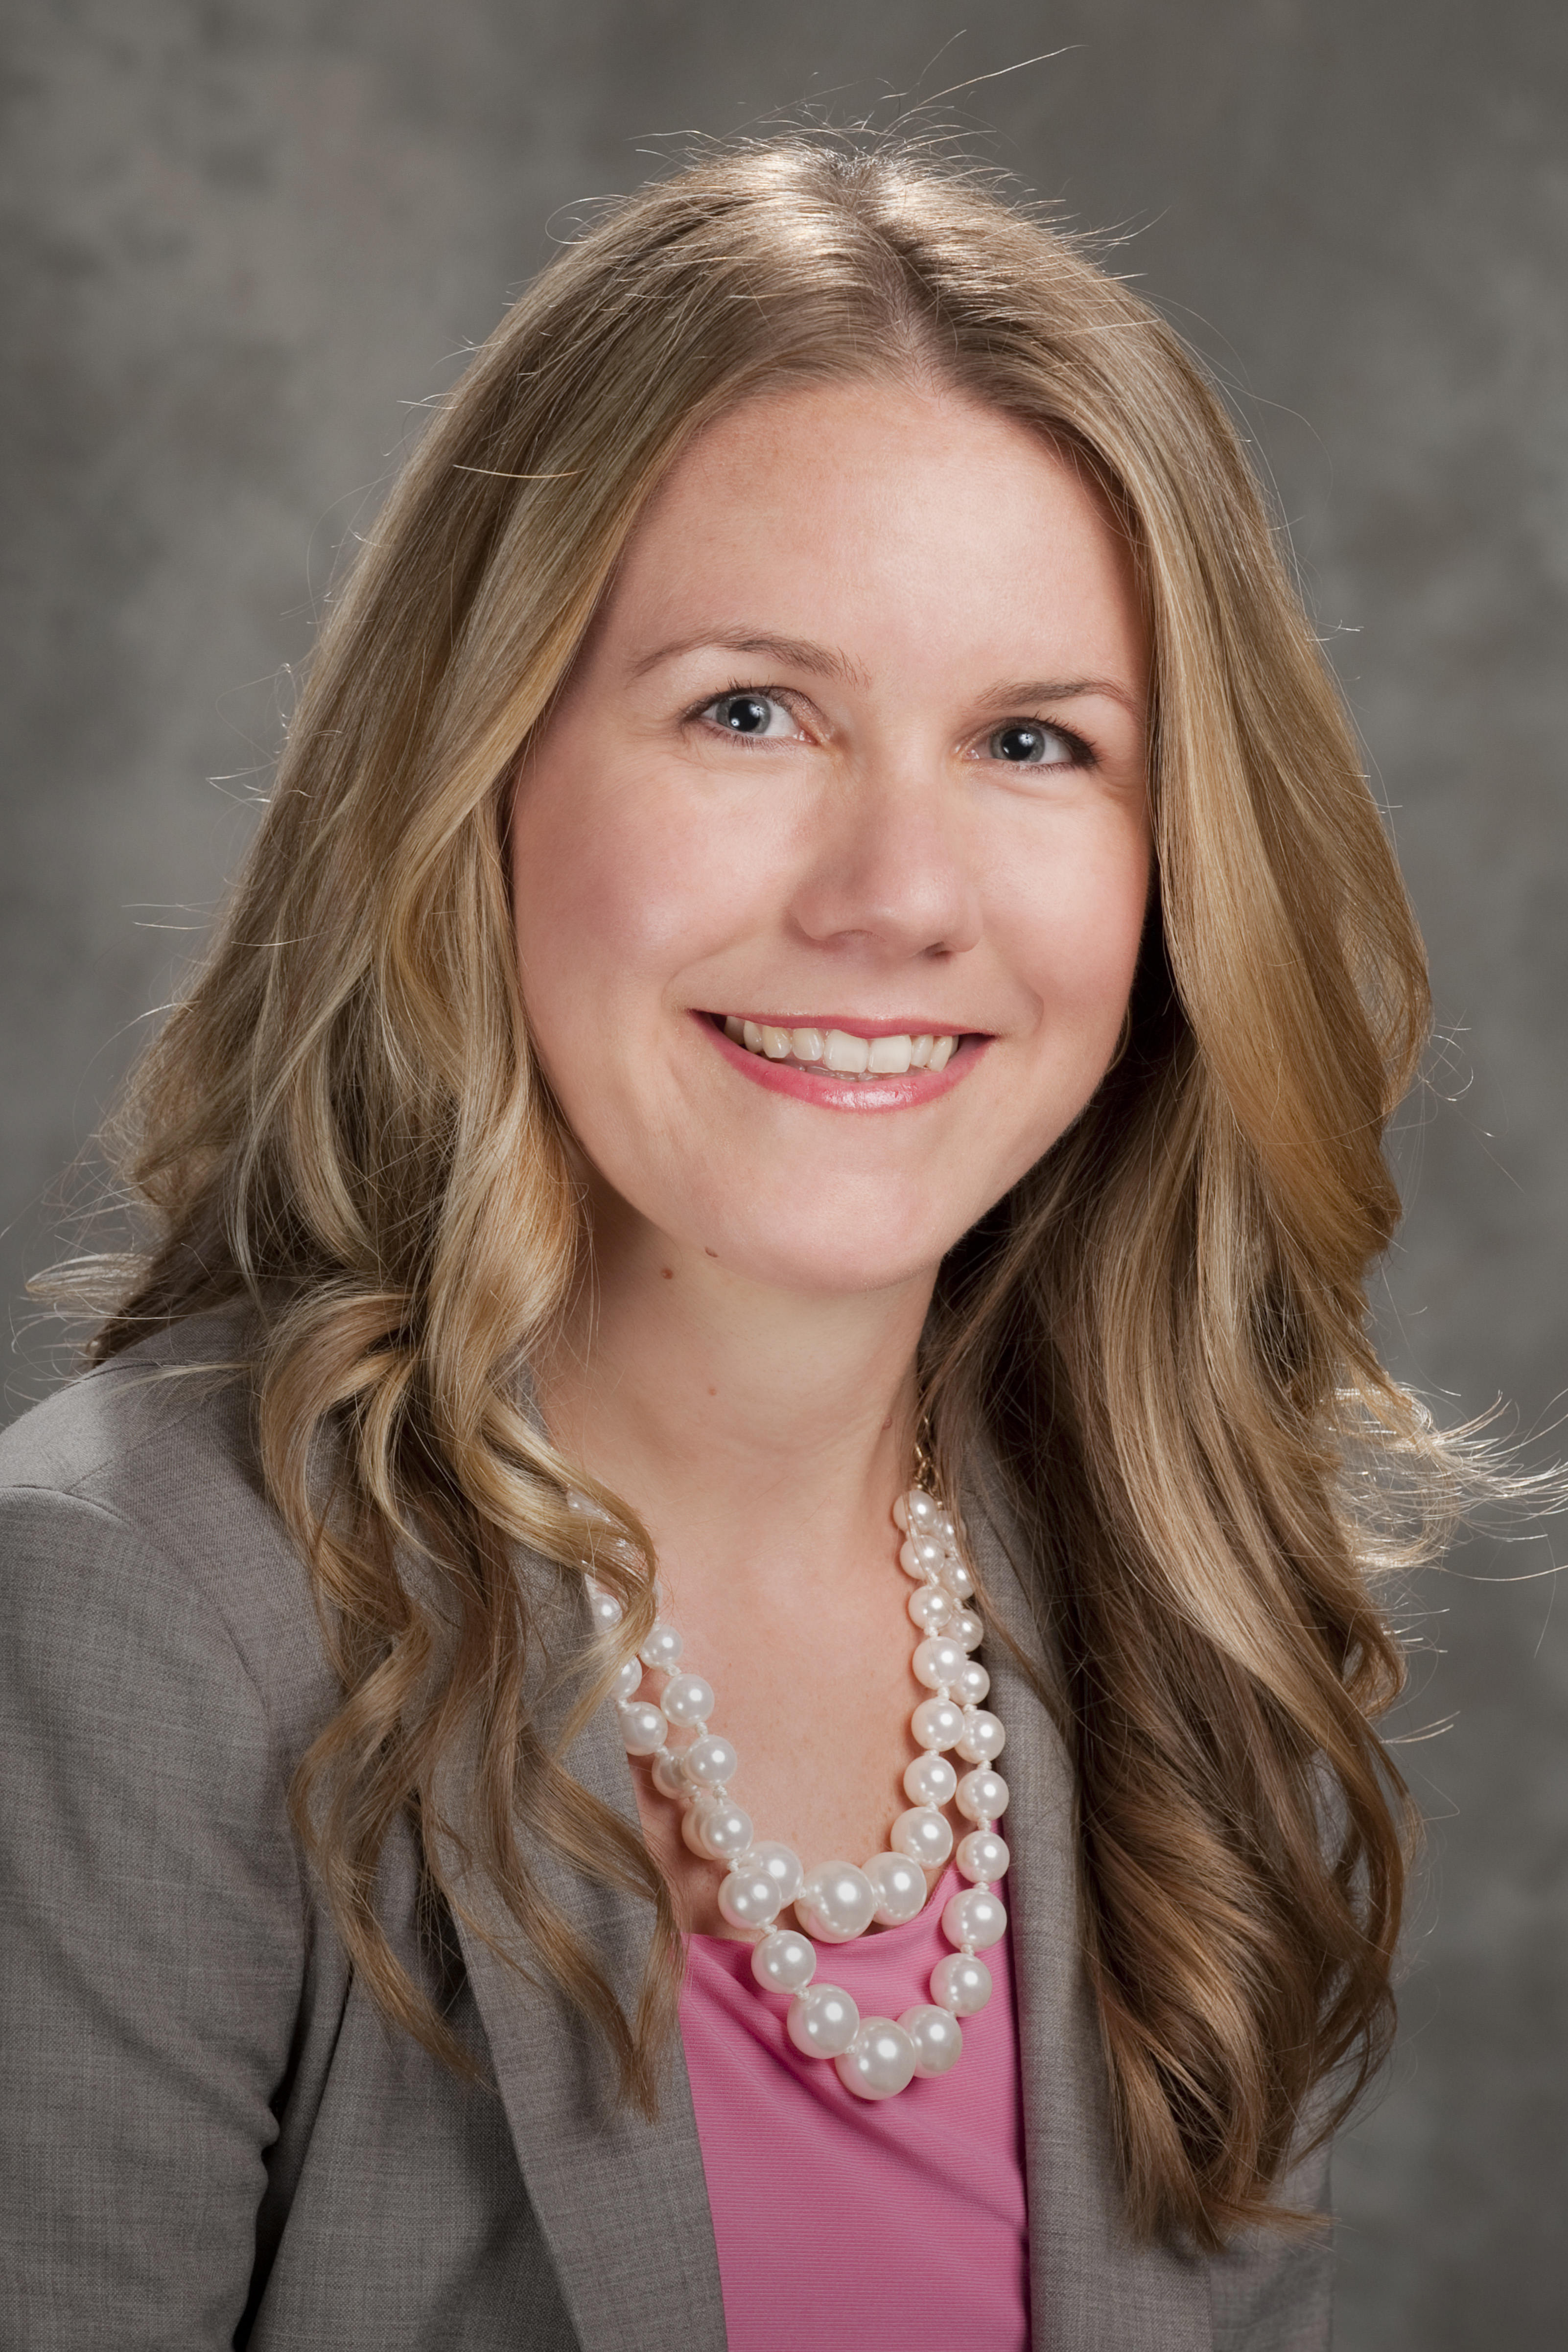 Cynthia Hansen - EVP & President, Gas Distribution & Storage of Enbridge